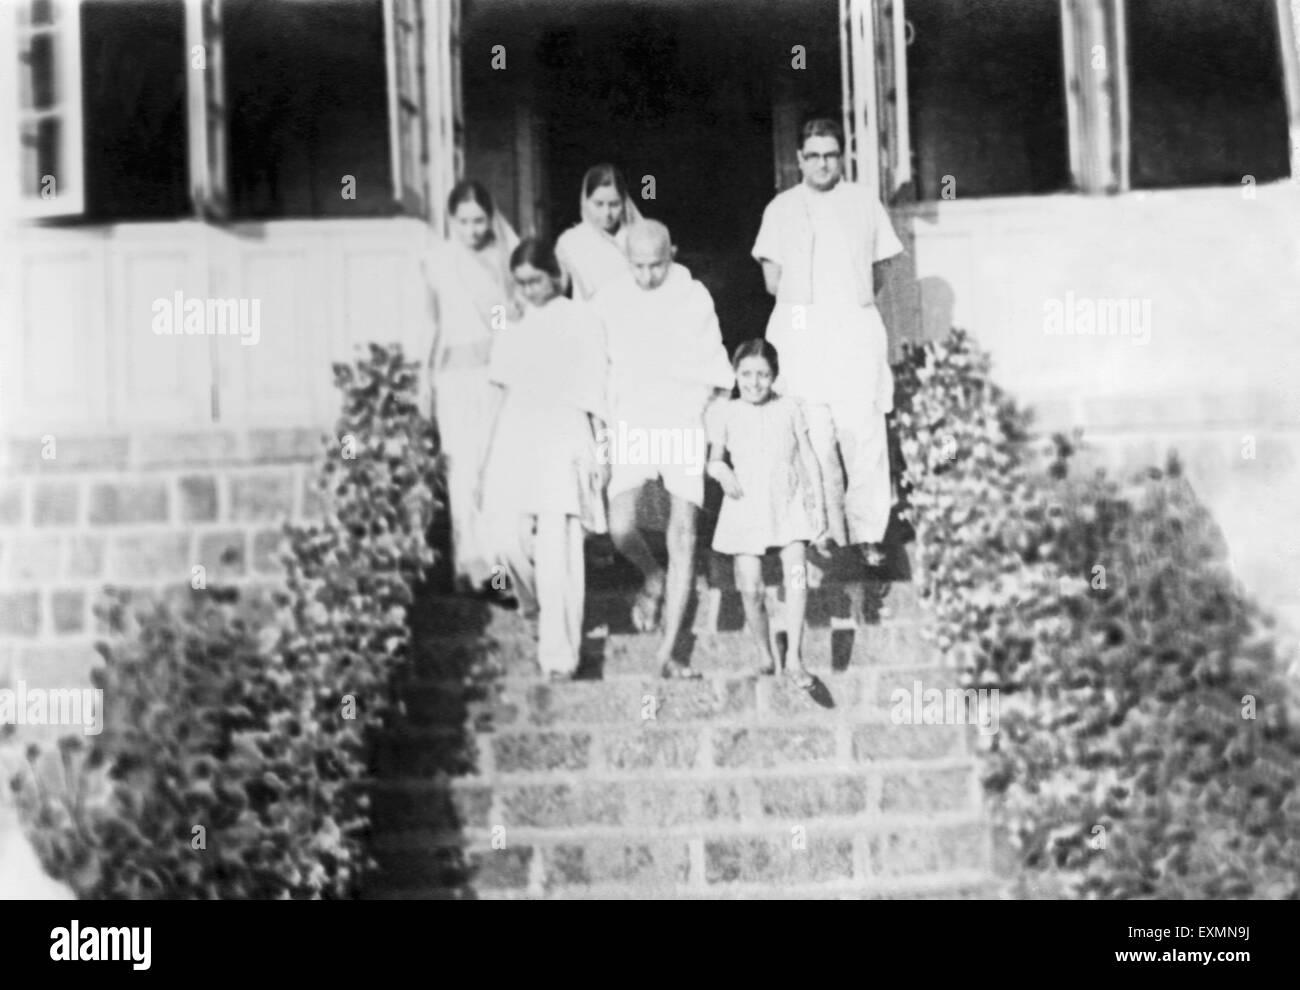 Mahatma Gandhi India 1940 - Stock Image